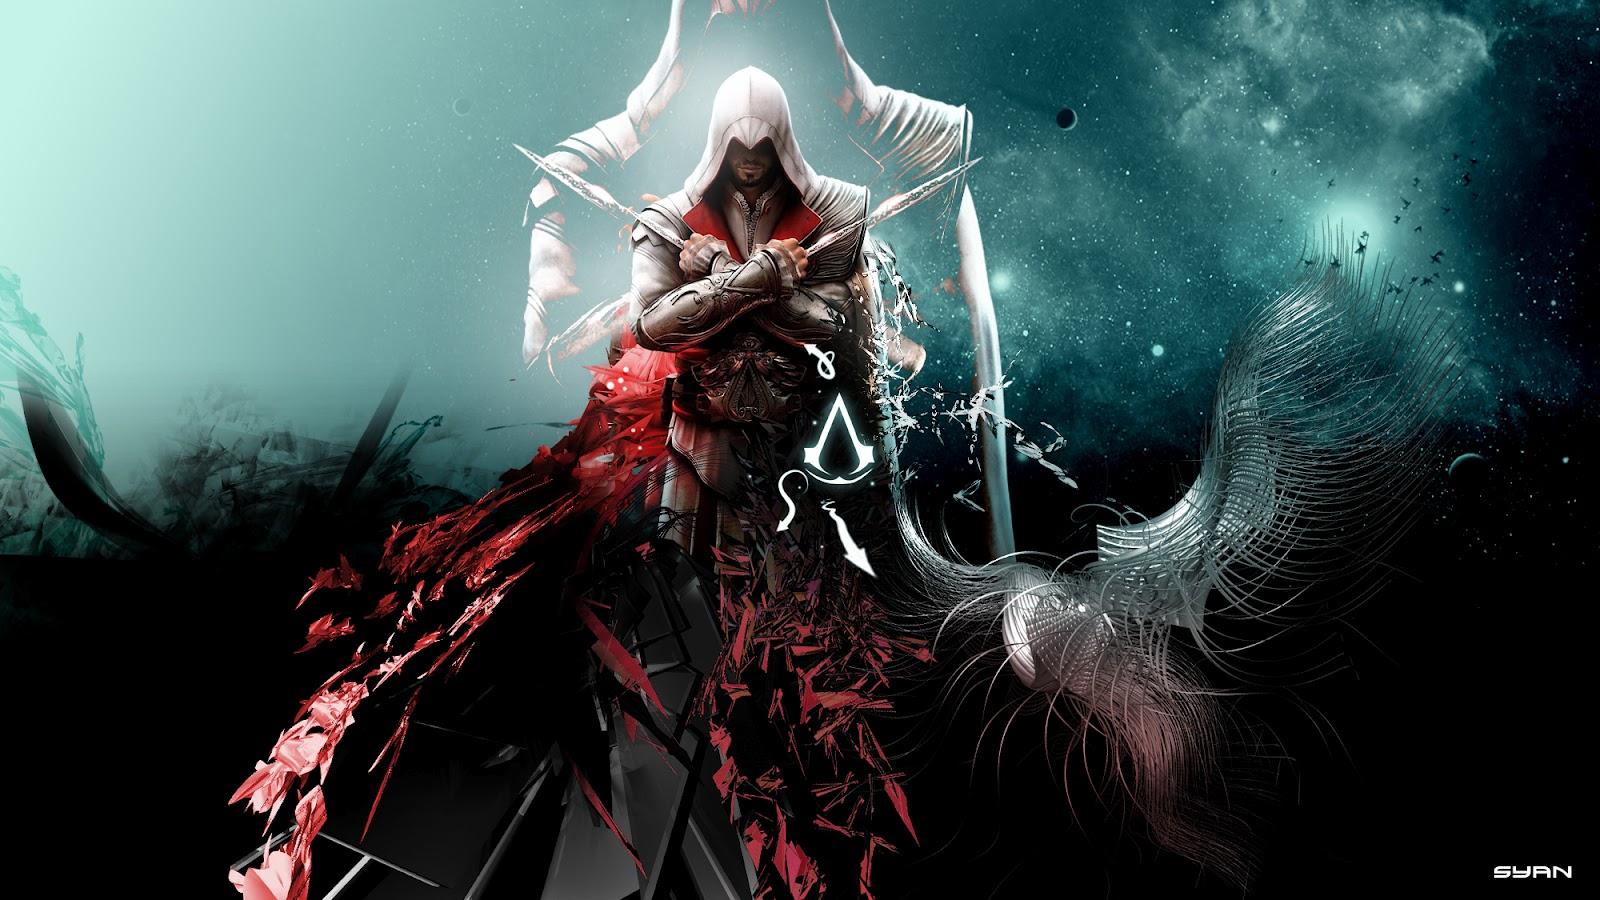 Assassin Creed HD Wallpaper 1080p   HD Dock 1600x900